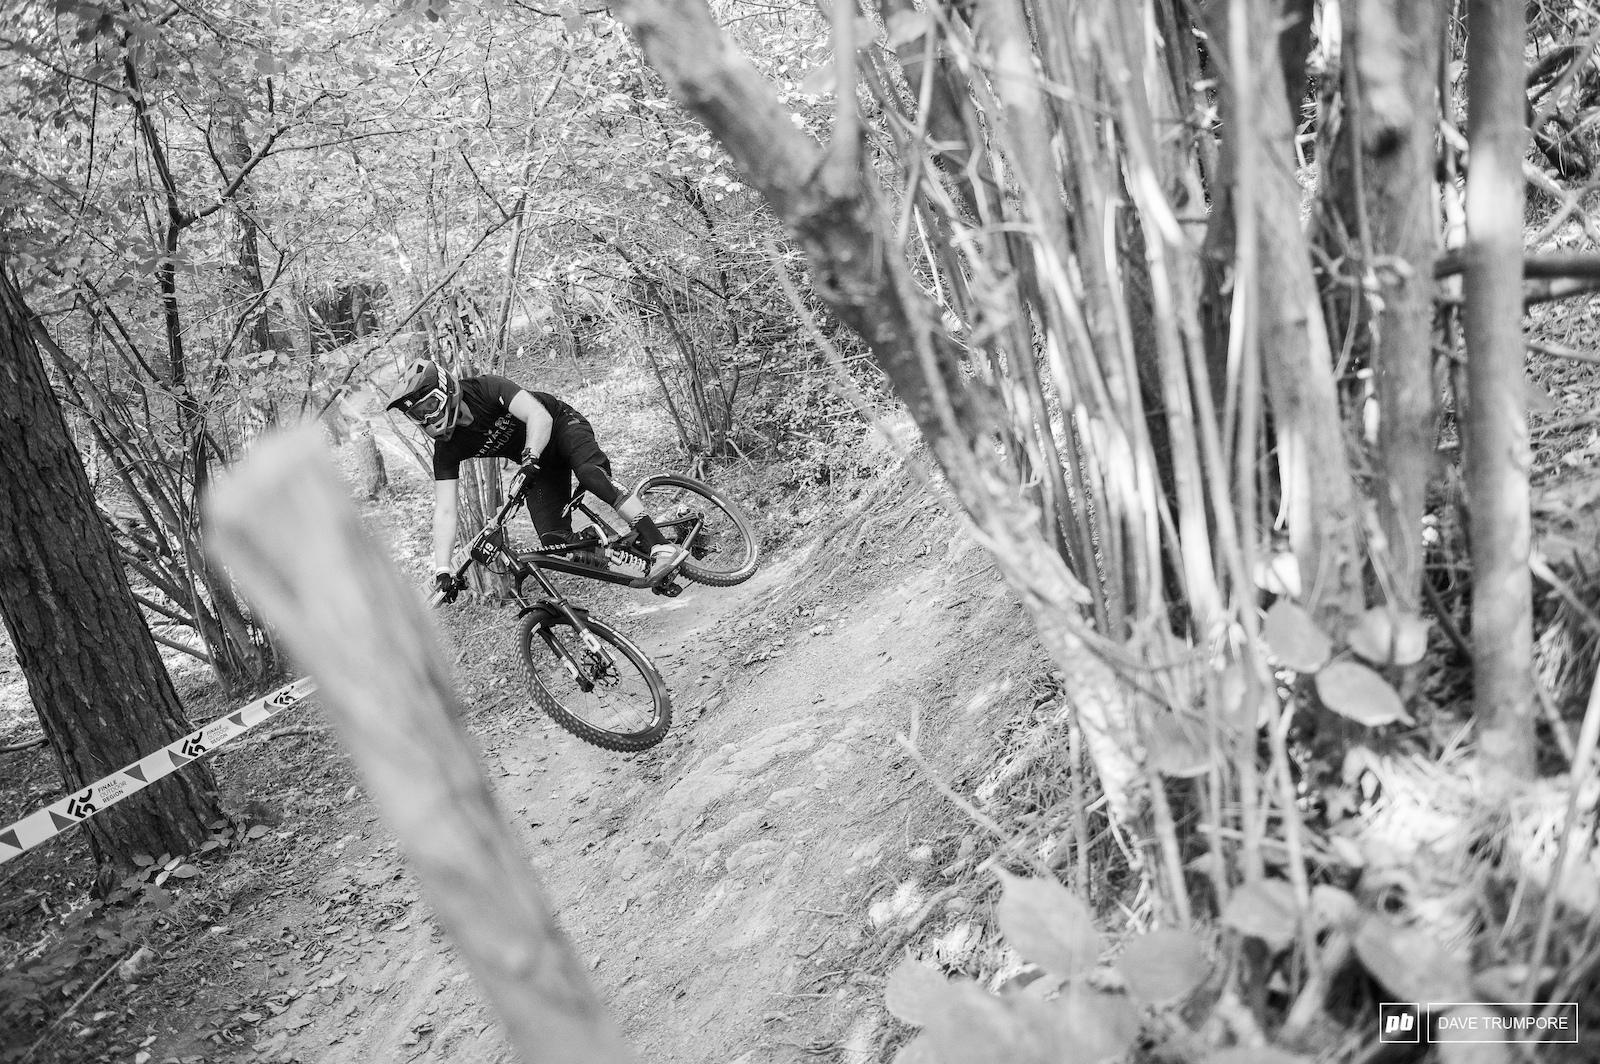 Matt Stuttard at the top of Stage 3